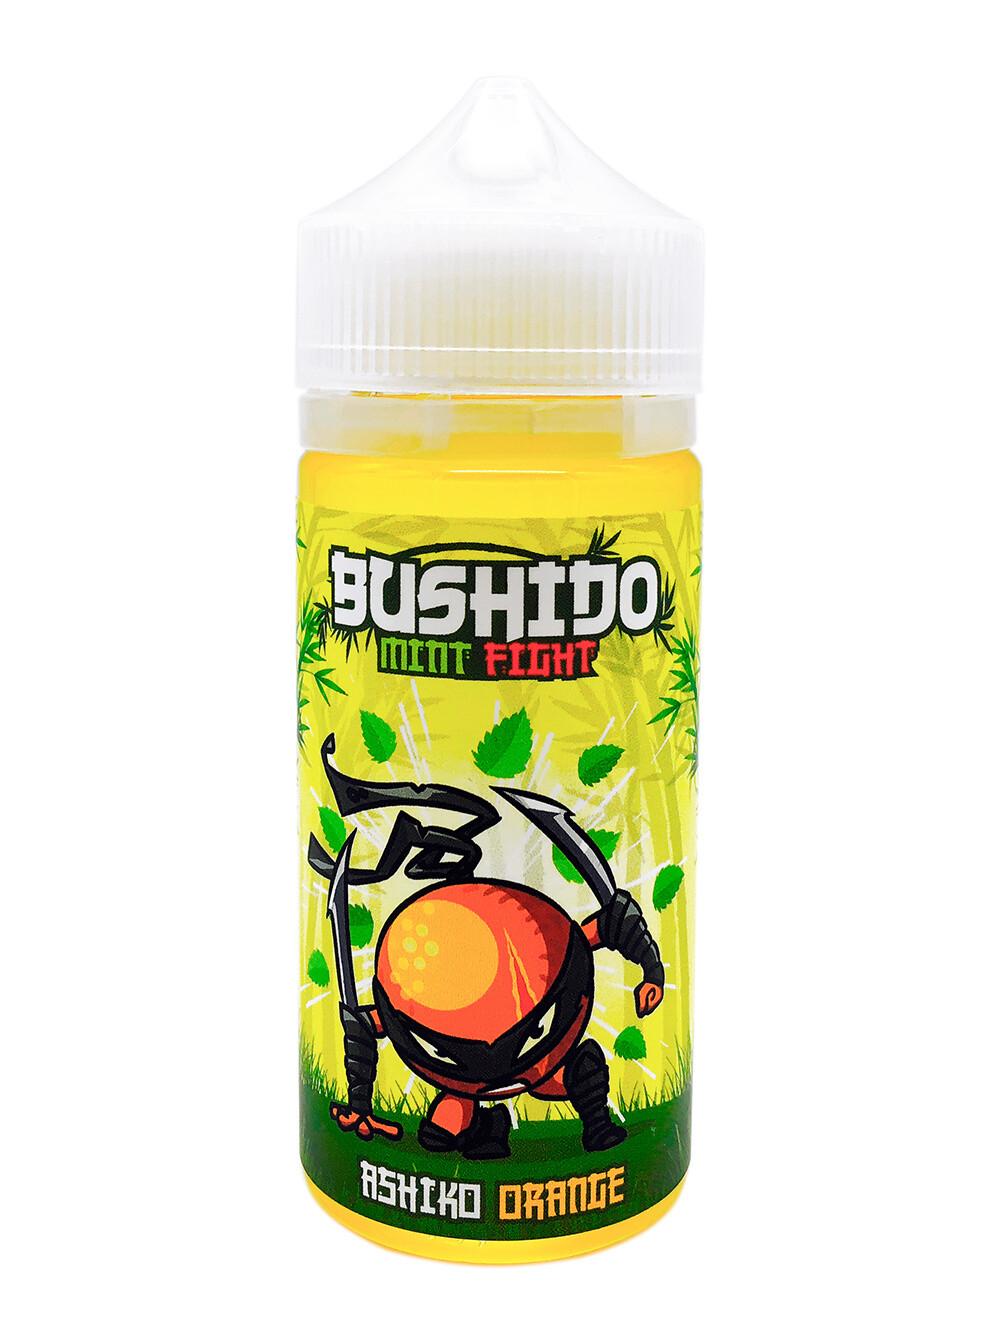 BUSHIDO MINT FIGHT: ASHIKO ORANGE 100ML